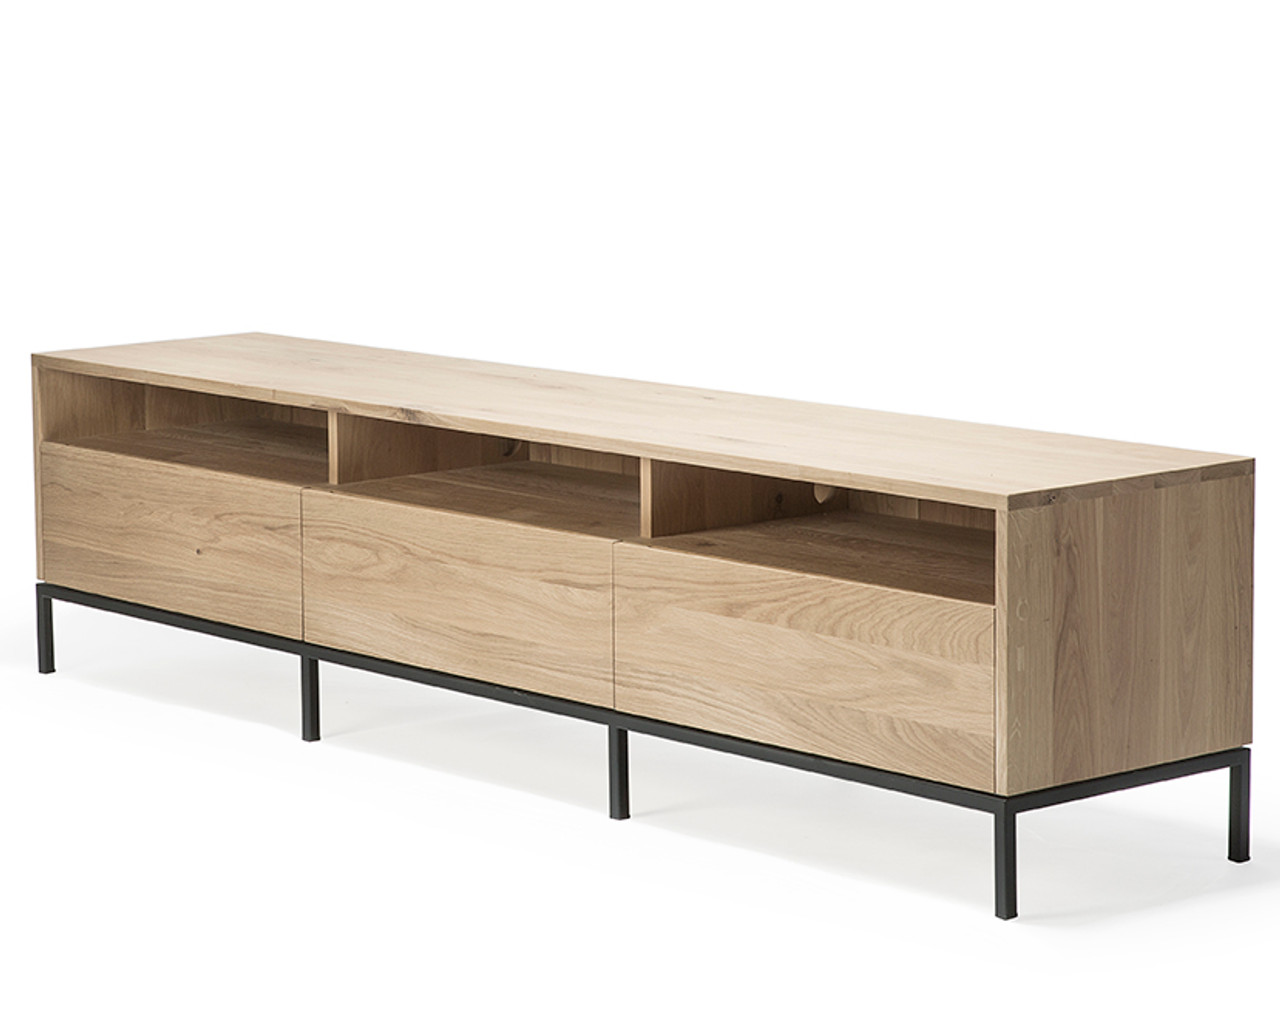 Oak Ligna TV Stand Media Cabinet